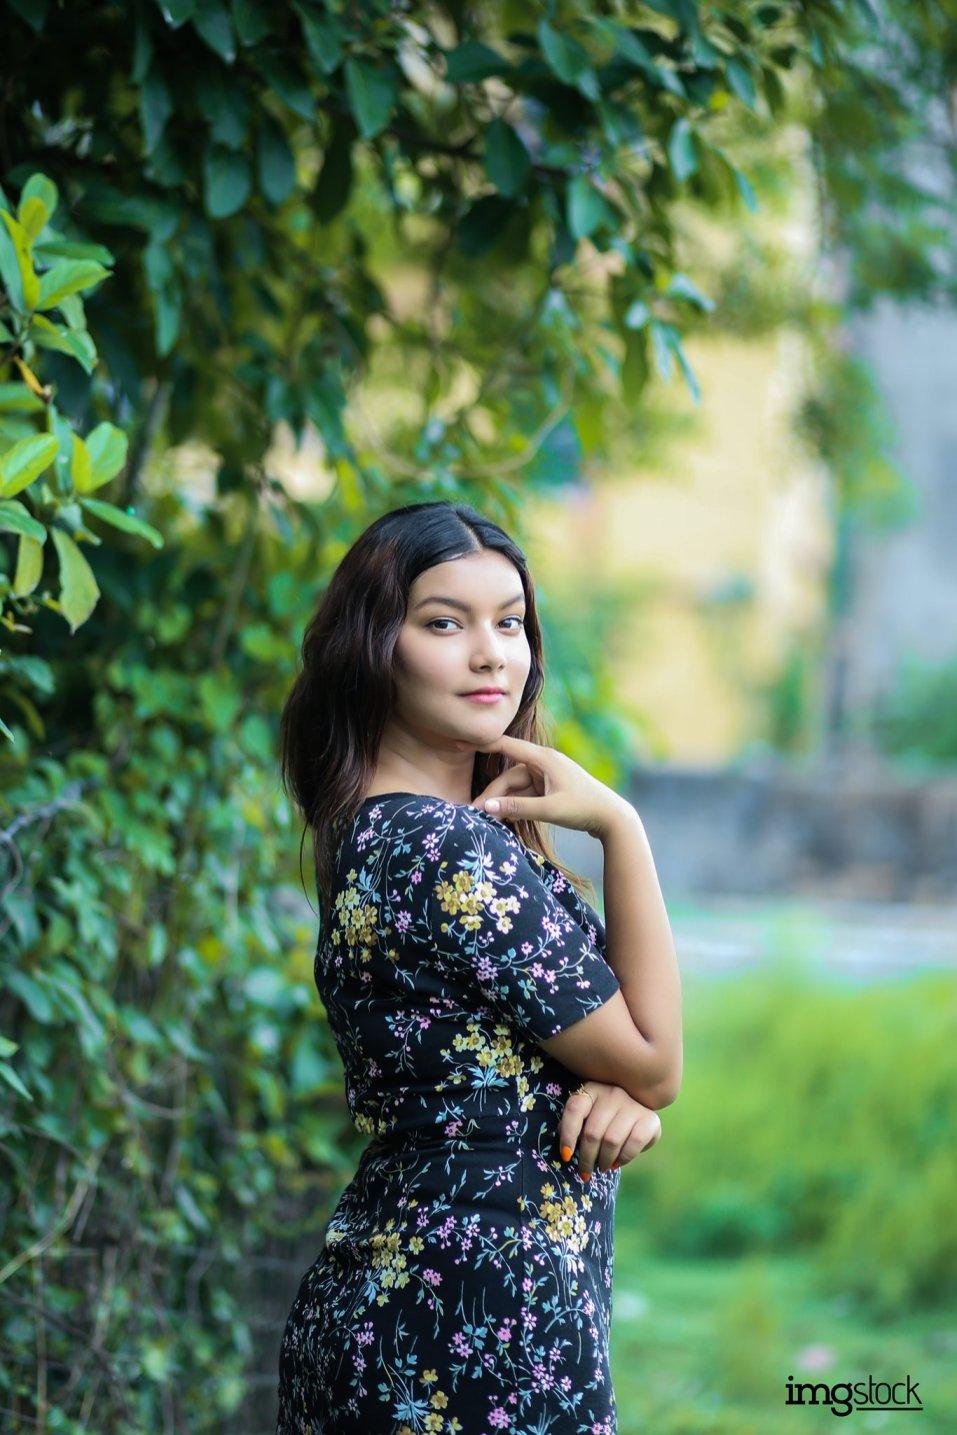 Silpa Subedi - Modeling Photography, ImgStock